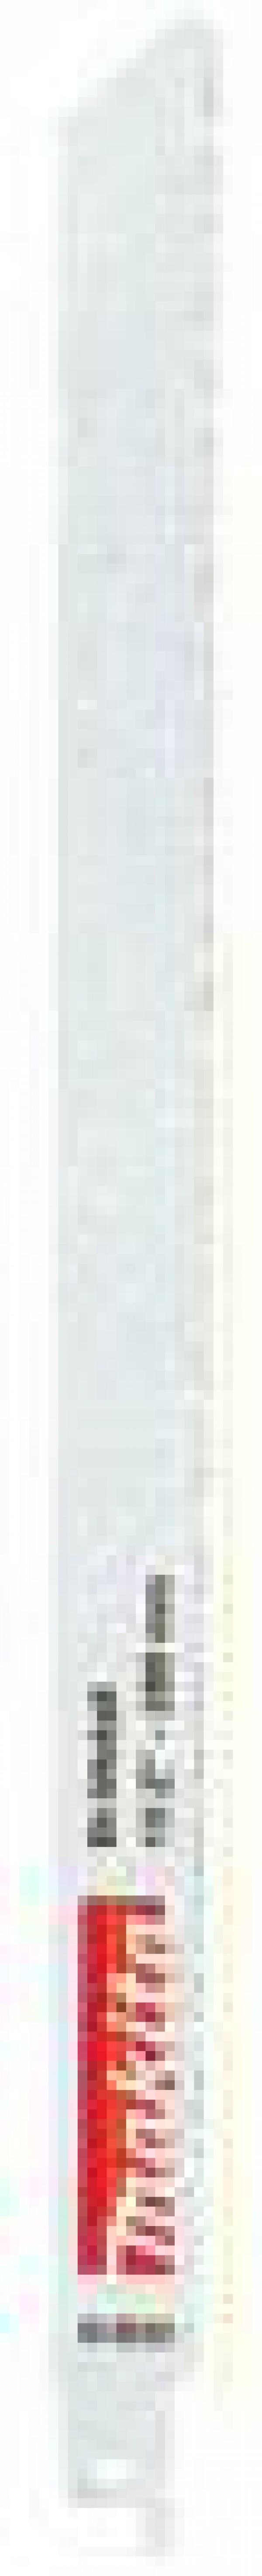 MAKITA-TESTERA HORIZONTALNA 290/10Z DRVO/METAL/P-04983